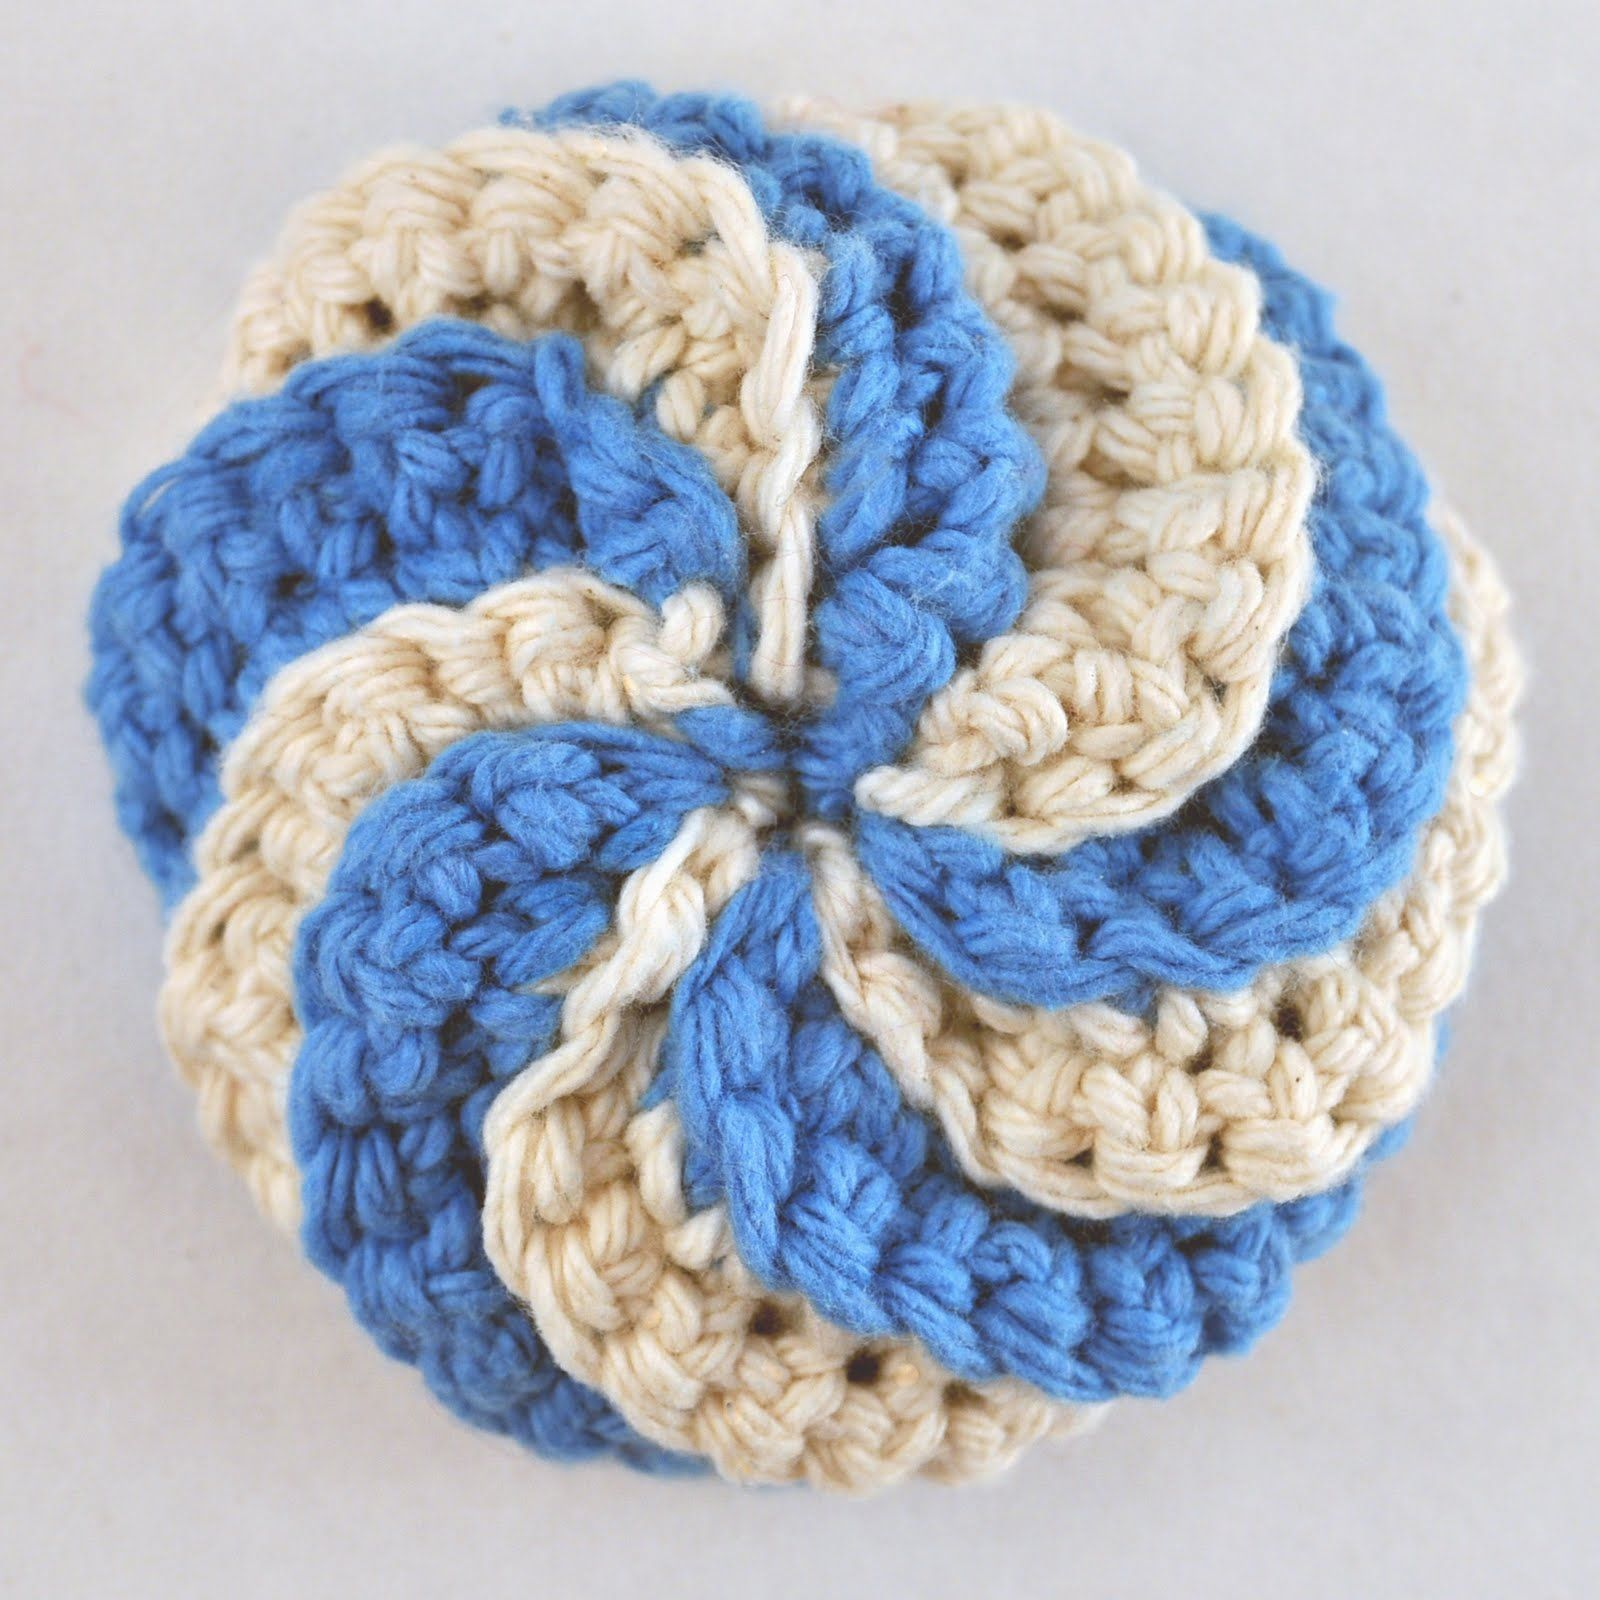 CrochetBeautyShoppe: Crochet Tawashi Scrubbies | Mamá | Pinterest ...